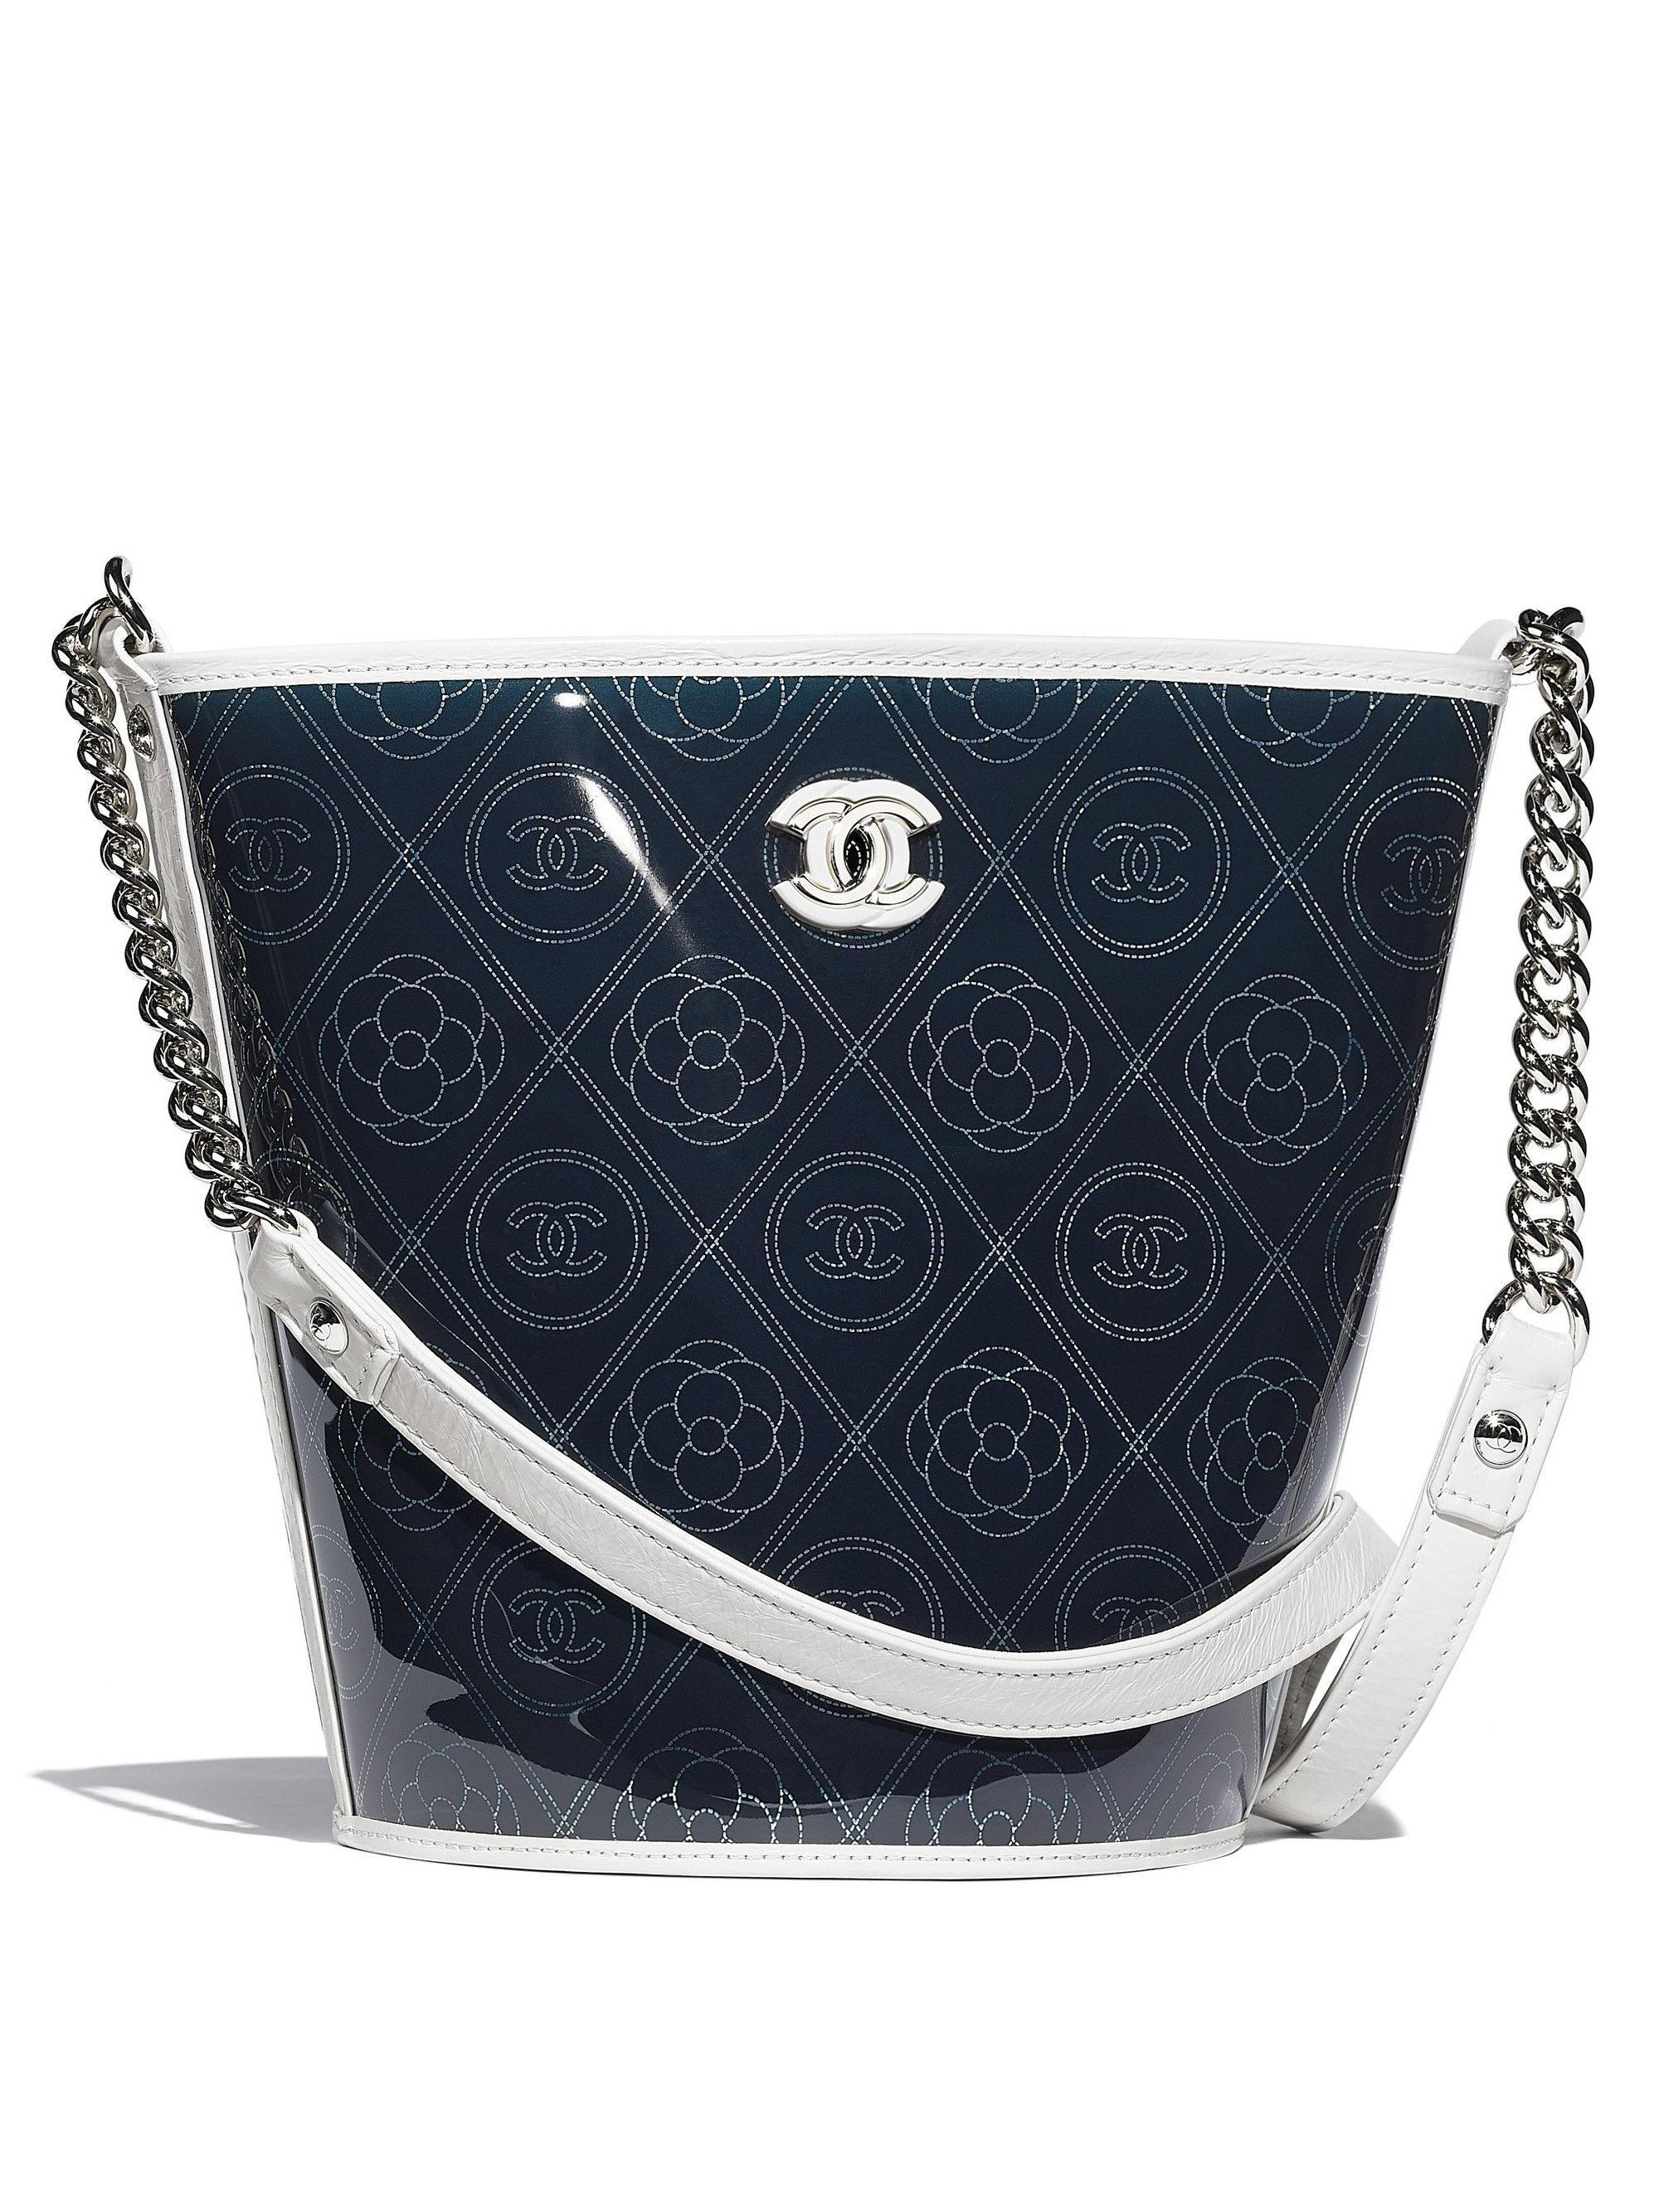 Chanel White Bucket Bag